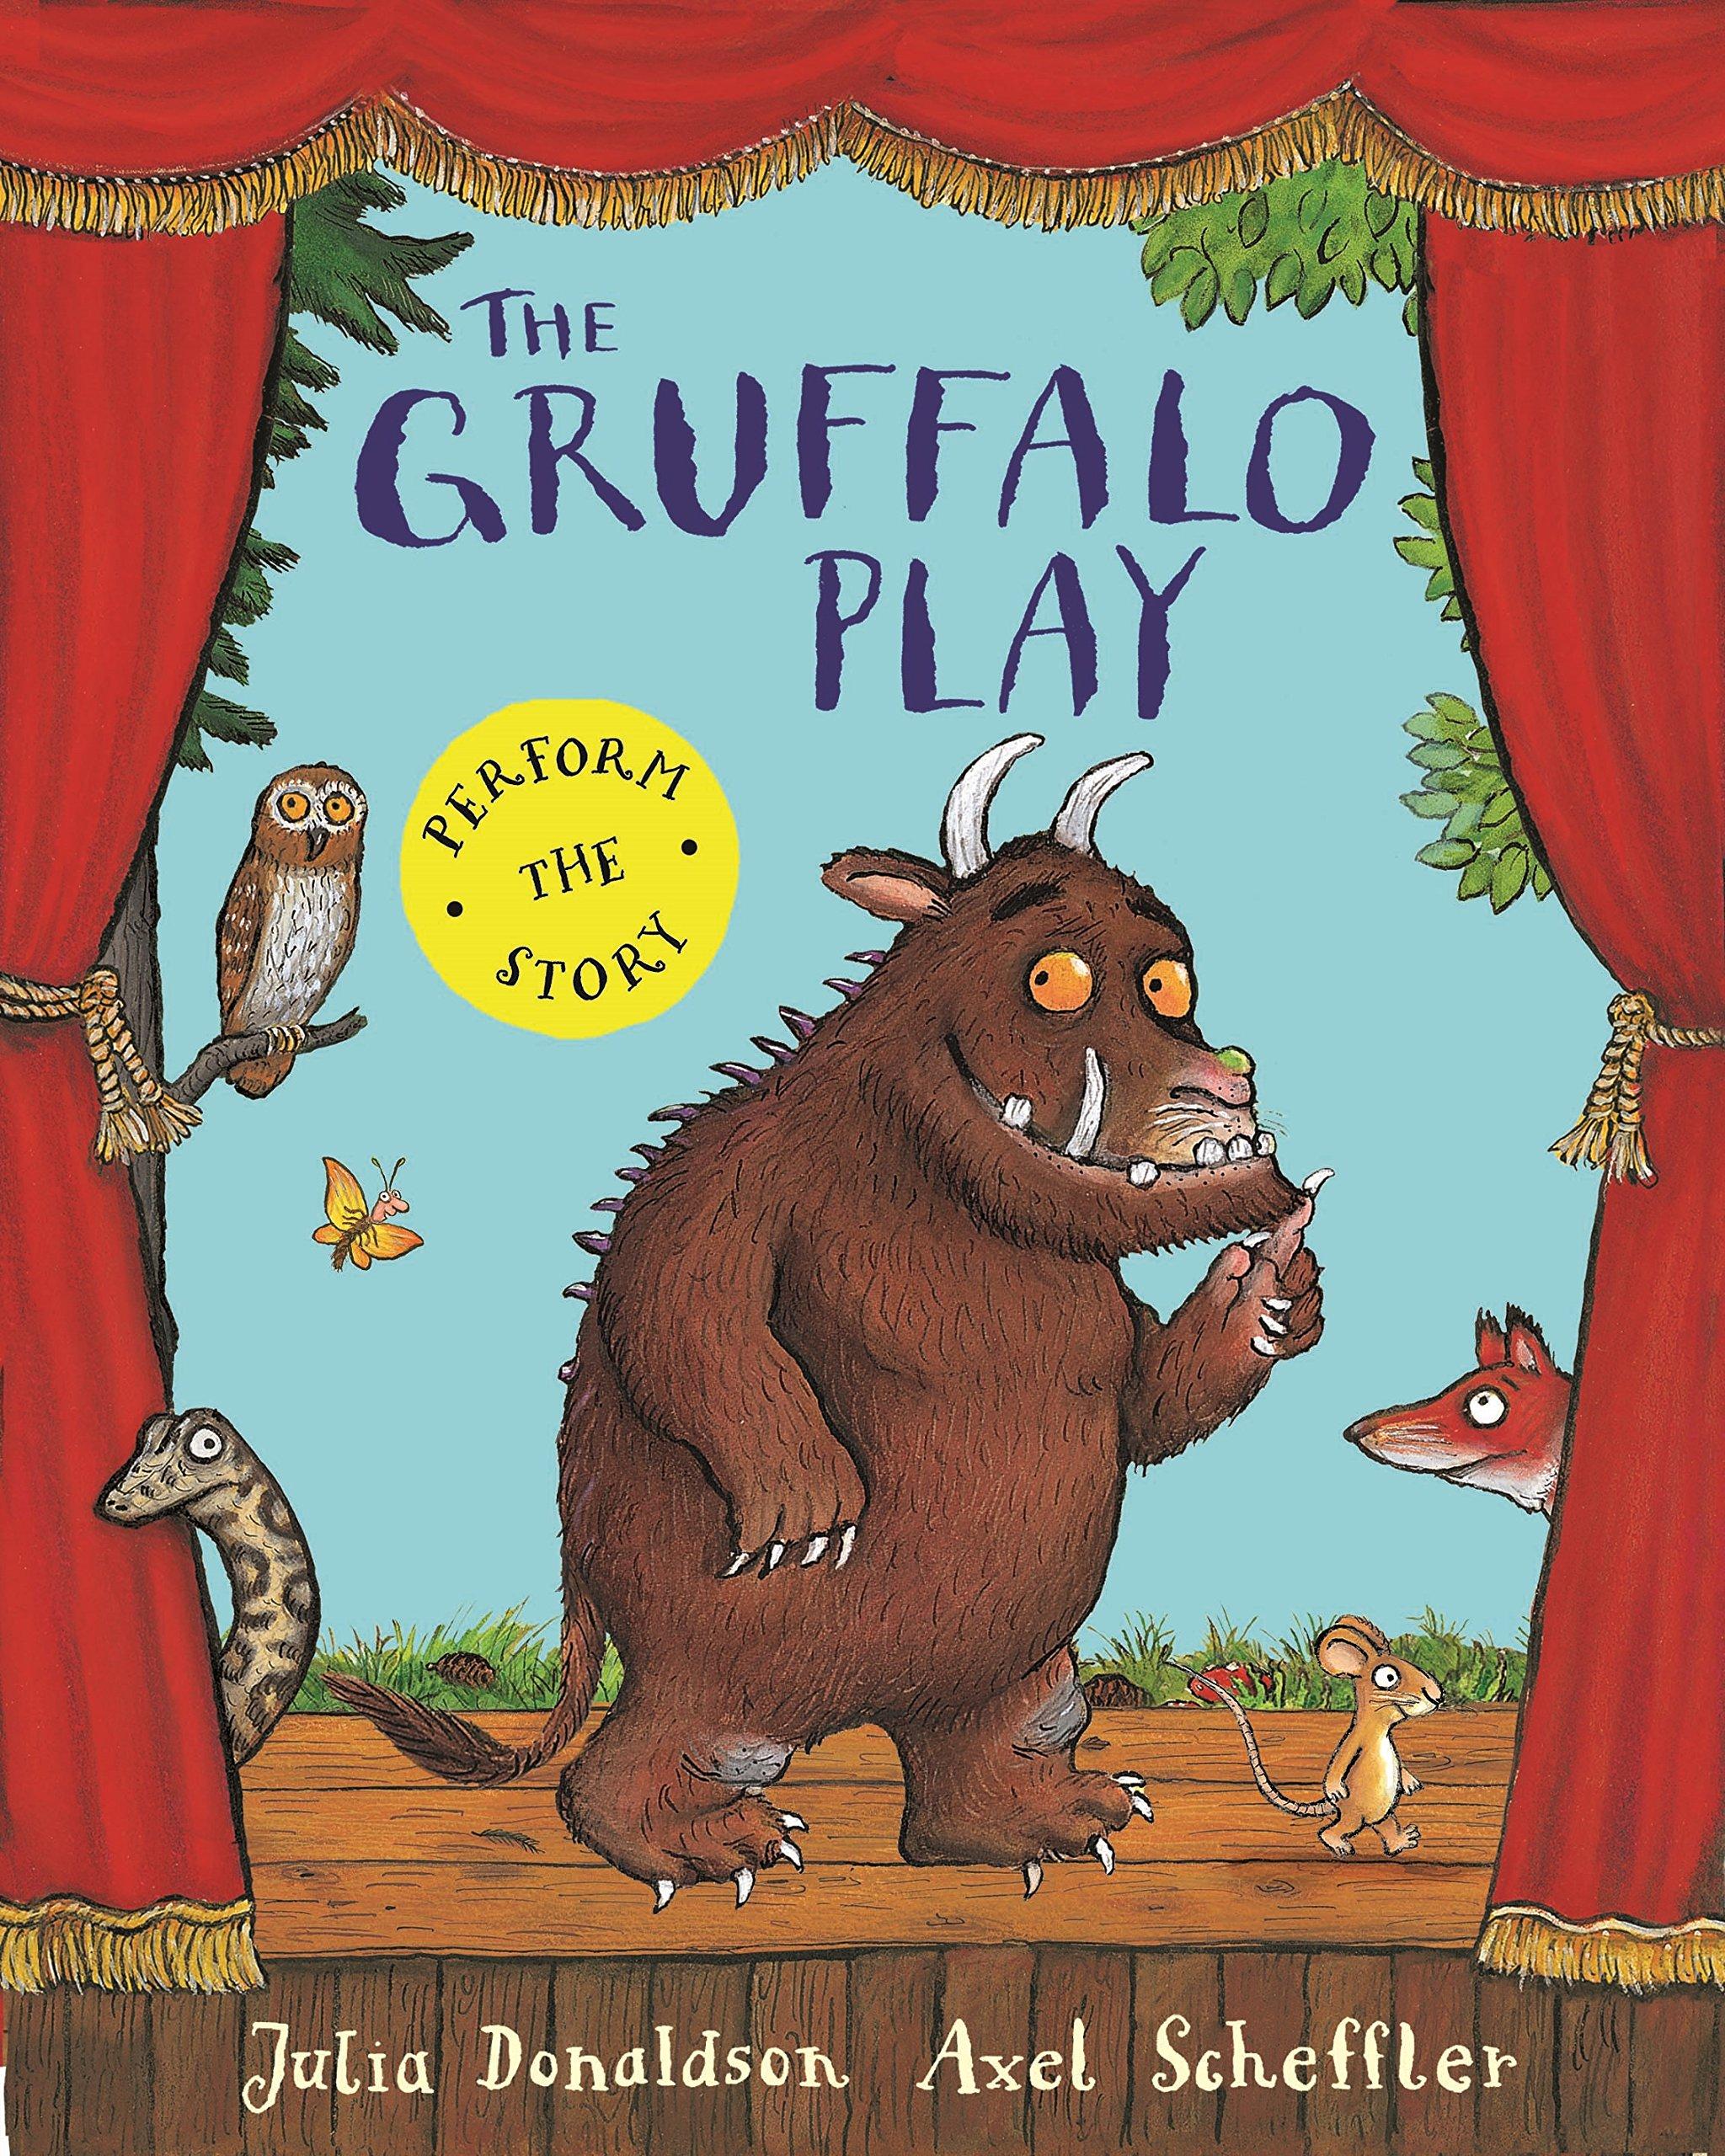 The Gruffalo Play